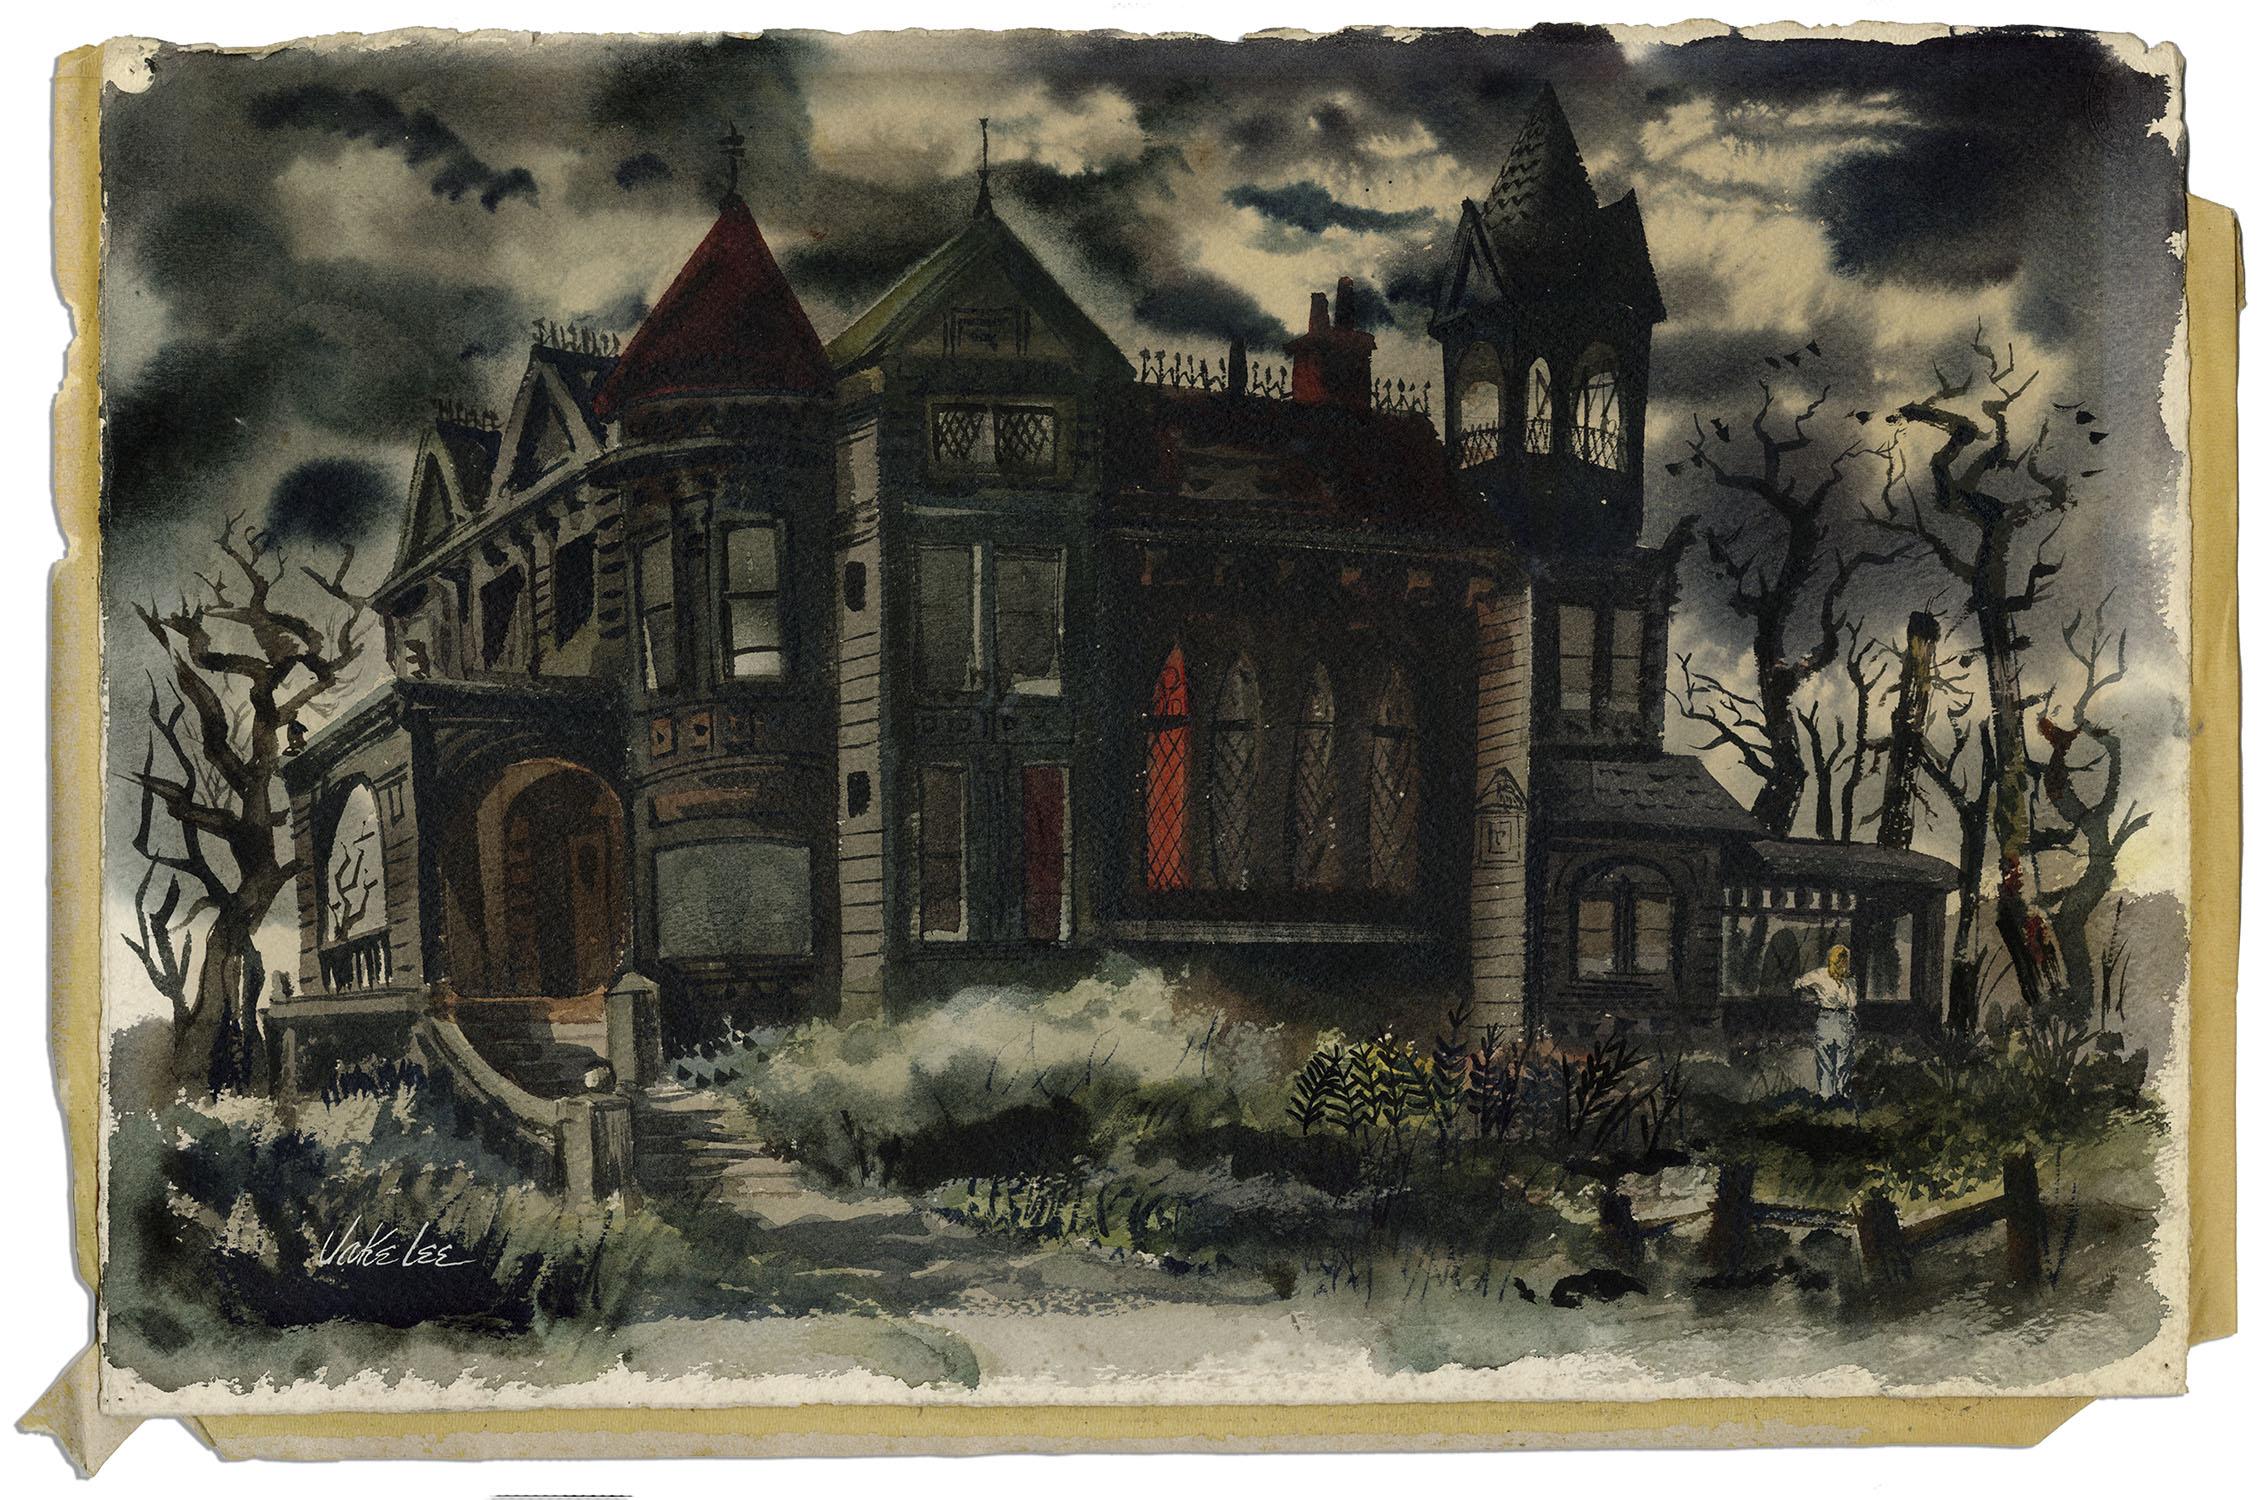 Ray Bradbury And Dark Side Of American >> Item Detail Ray Bradbury Personally Owned Watercolor Painting By